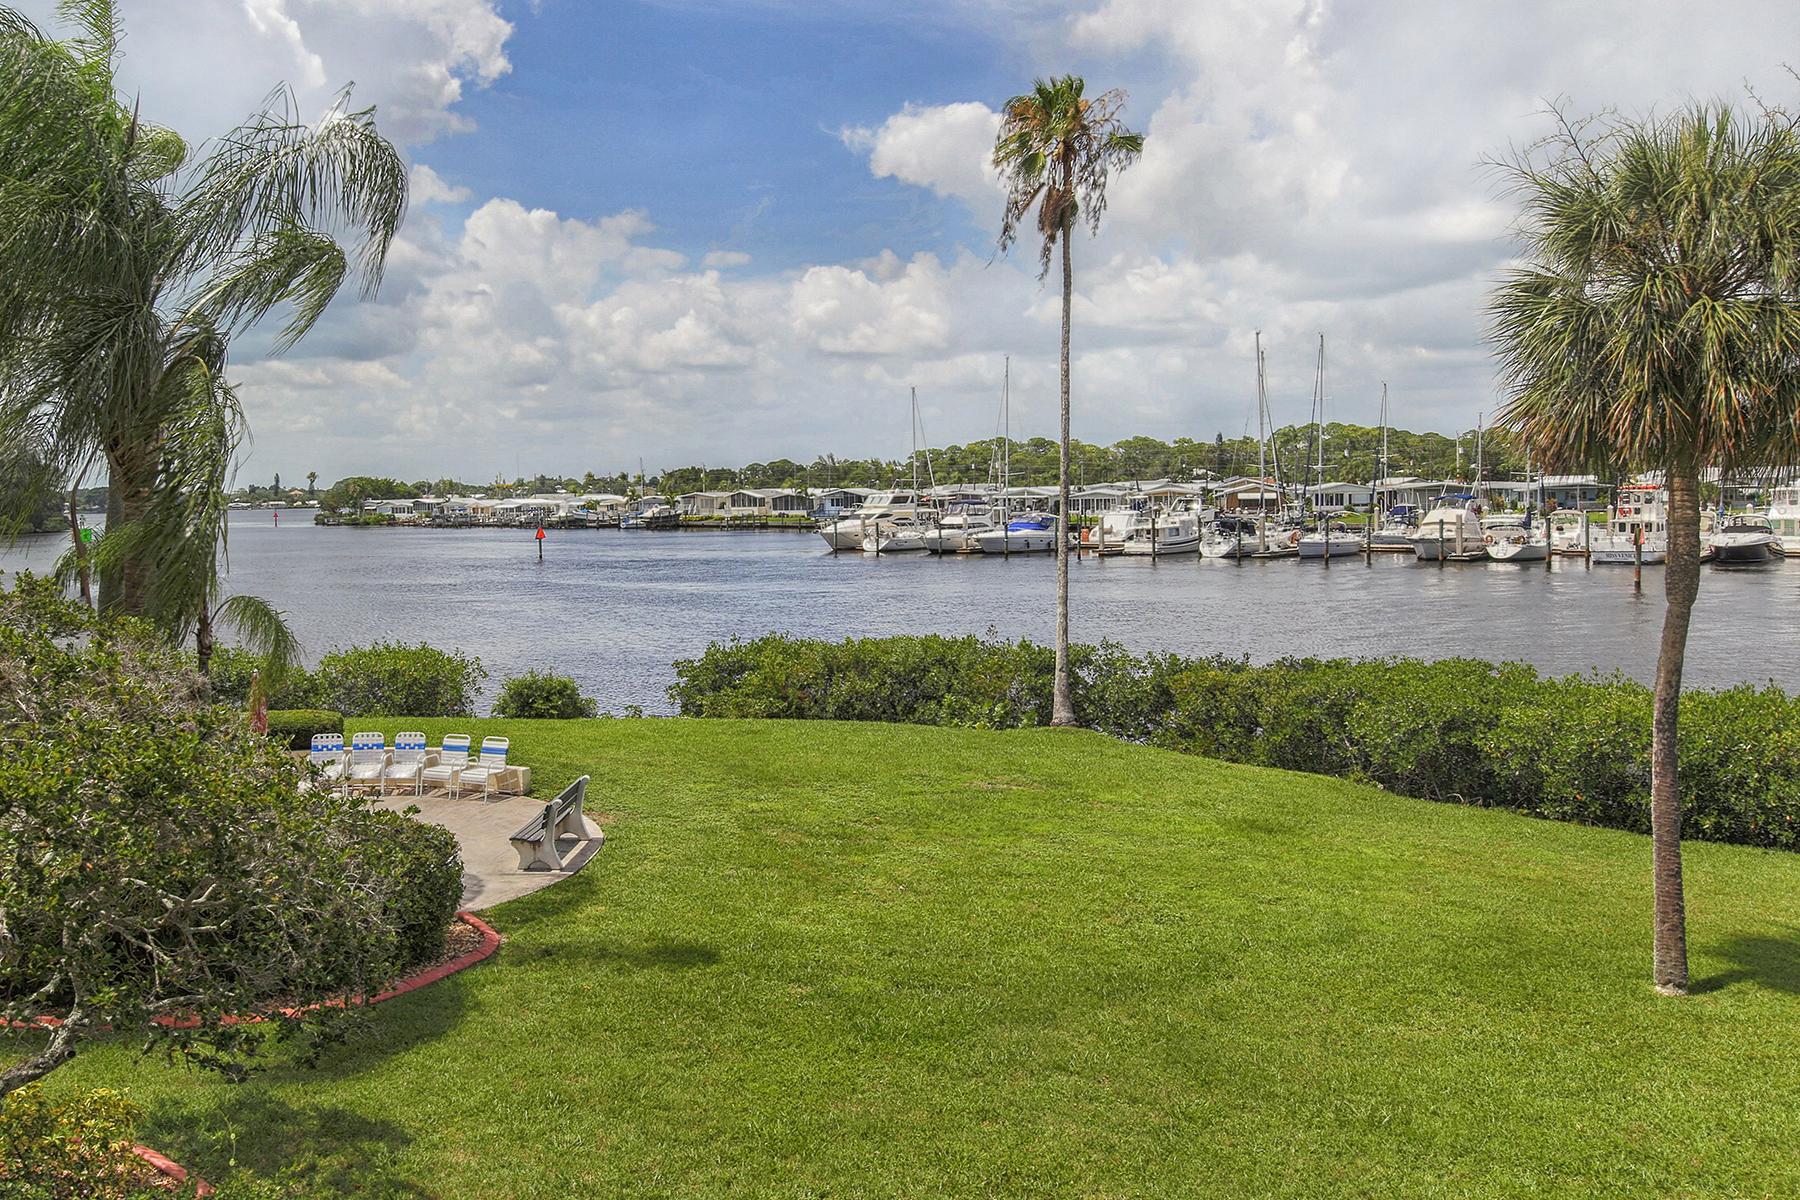 Condominium for Sale at BELLA COSTA - VENICE ISLAND 250 Santa Maria St 214 Venice, Florida, 34285 United States